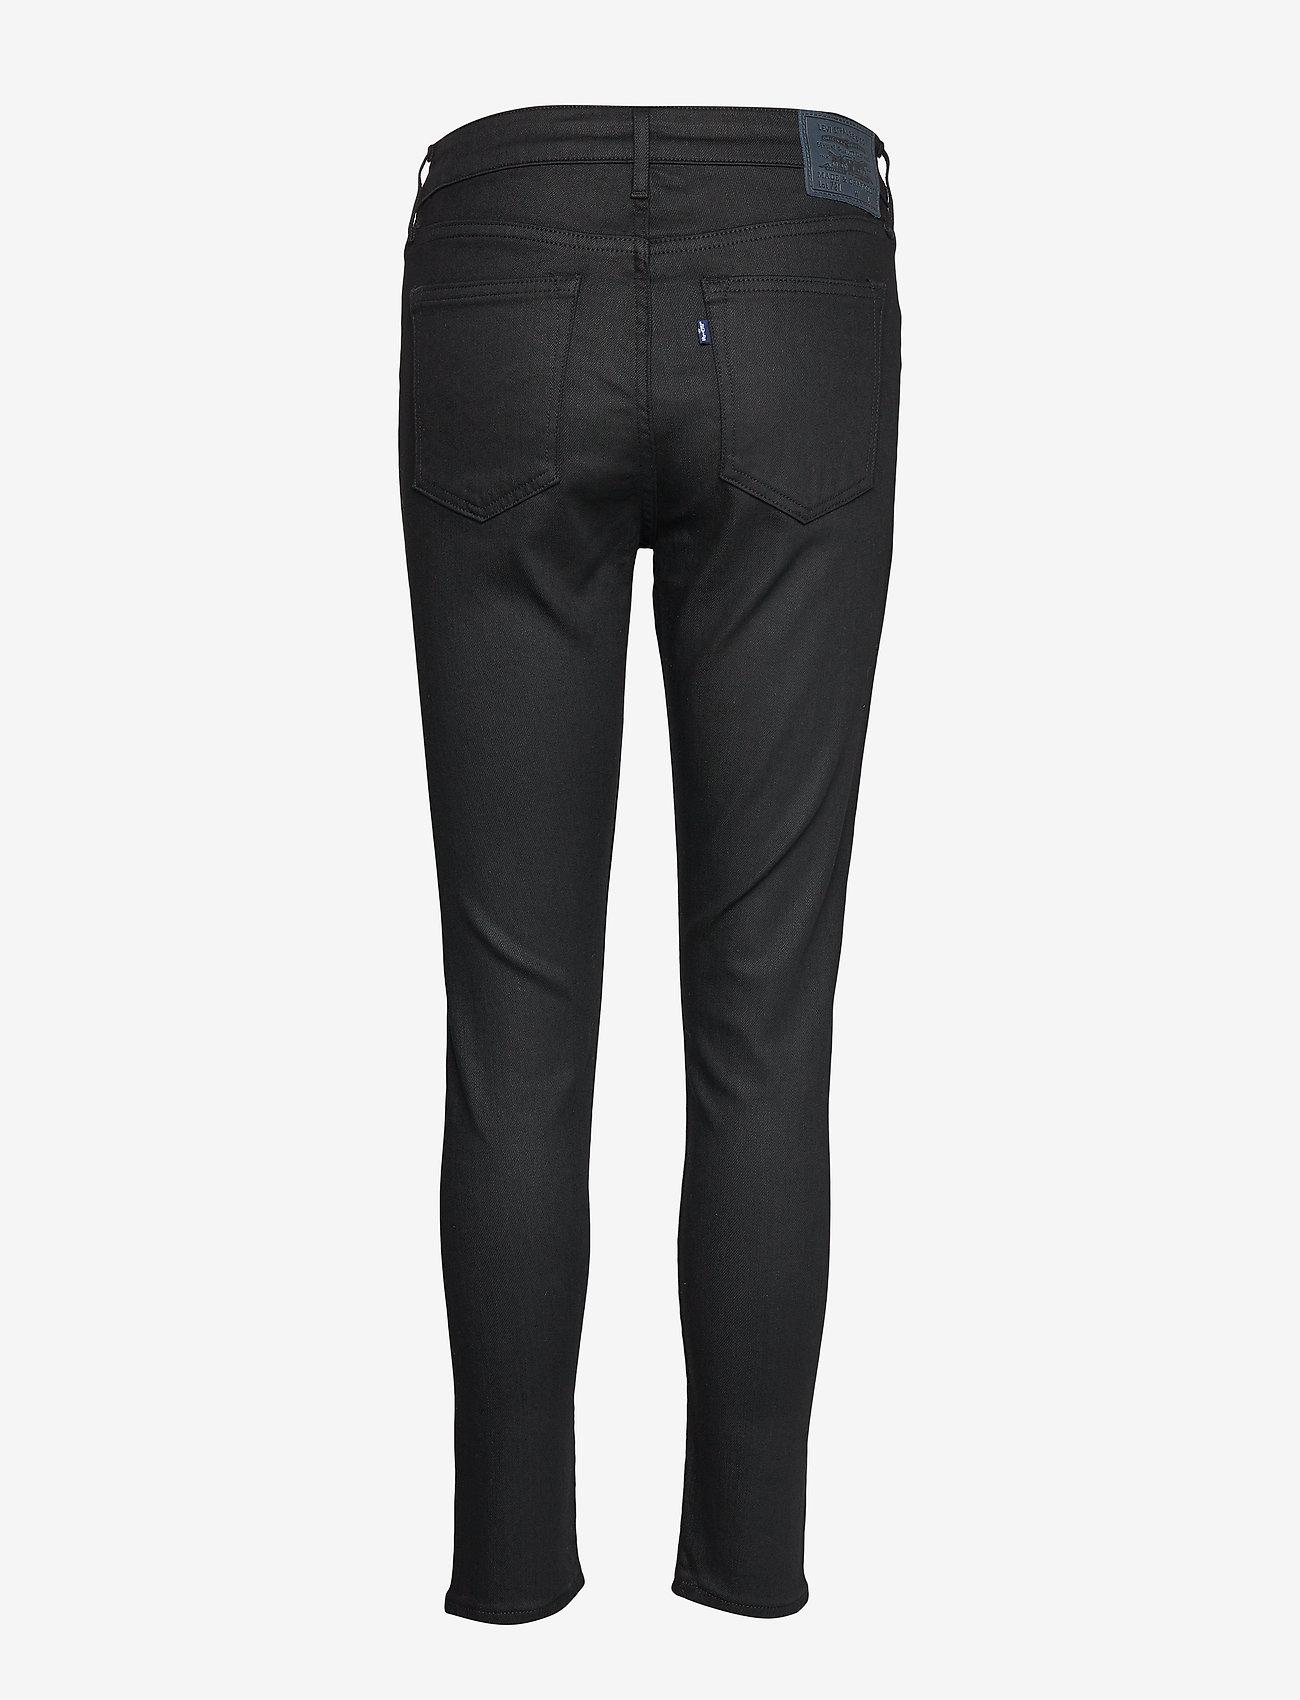 Levi's Made & Crafted - LMC 721 LMC STAY BLACK - skinny farkut - blacks - 1